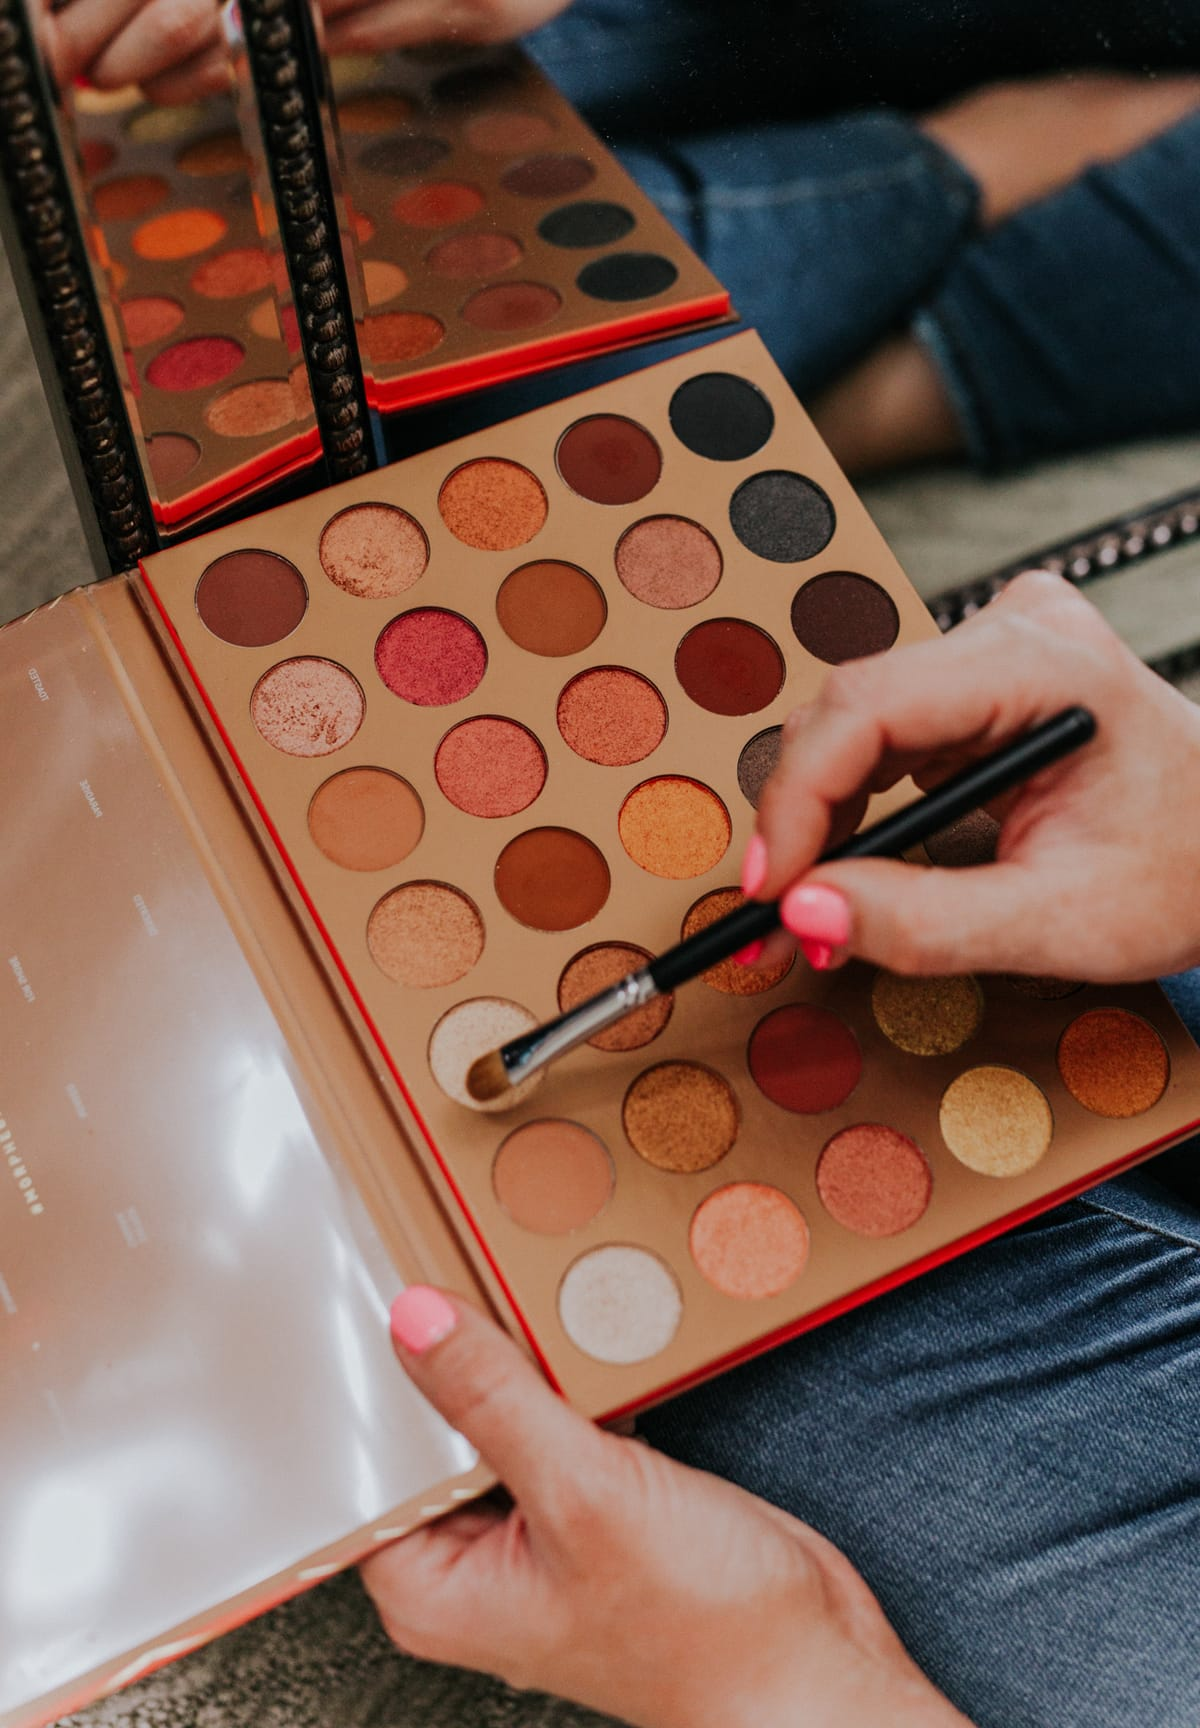 Morphe eyeshadow palette makeup bag